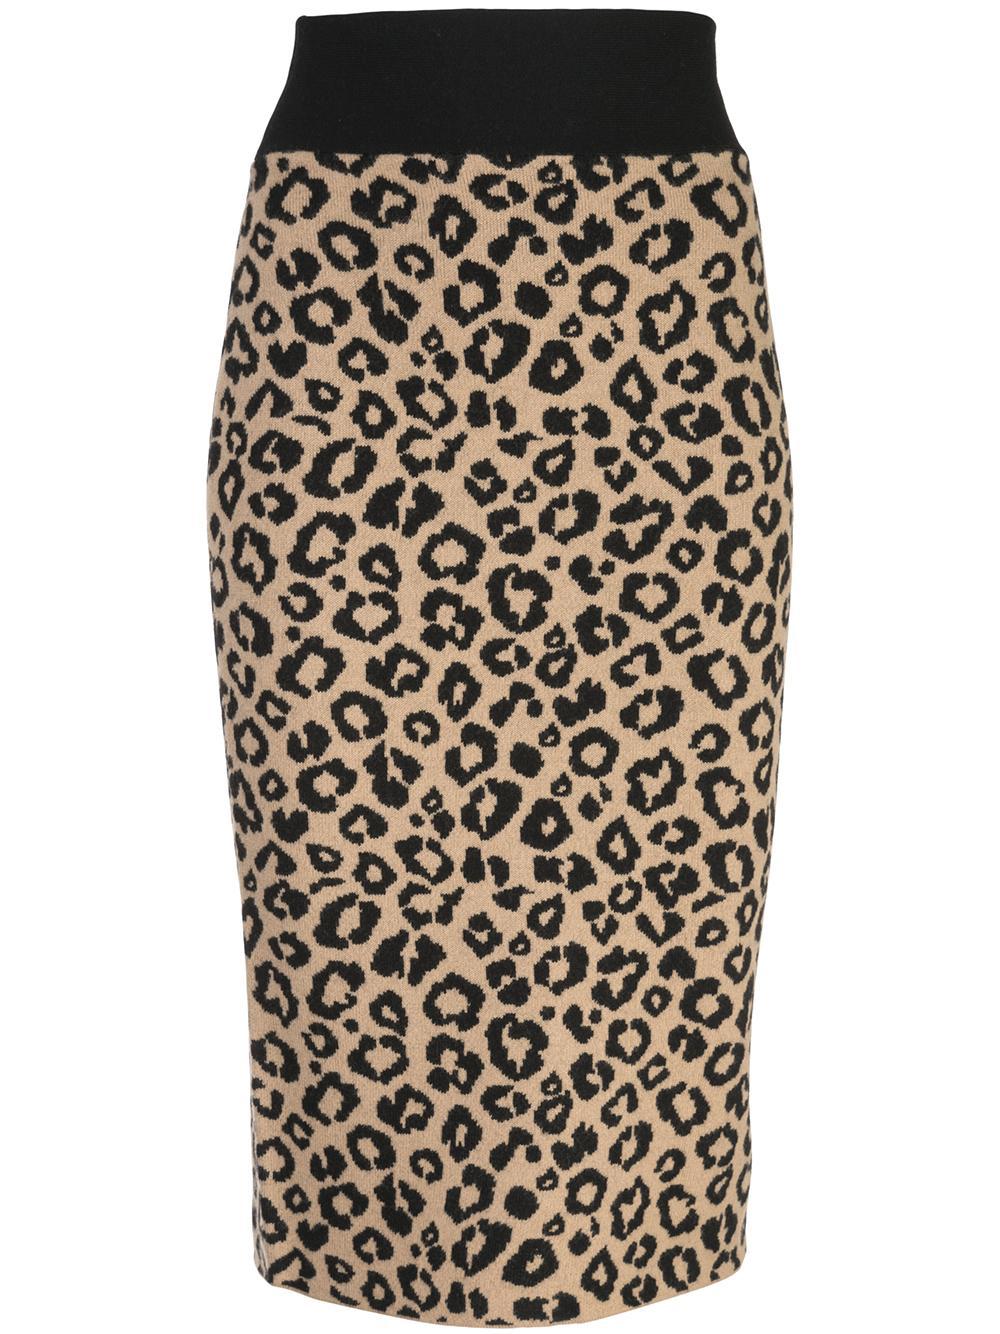 Bethel Leopard Print Knit Skirt